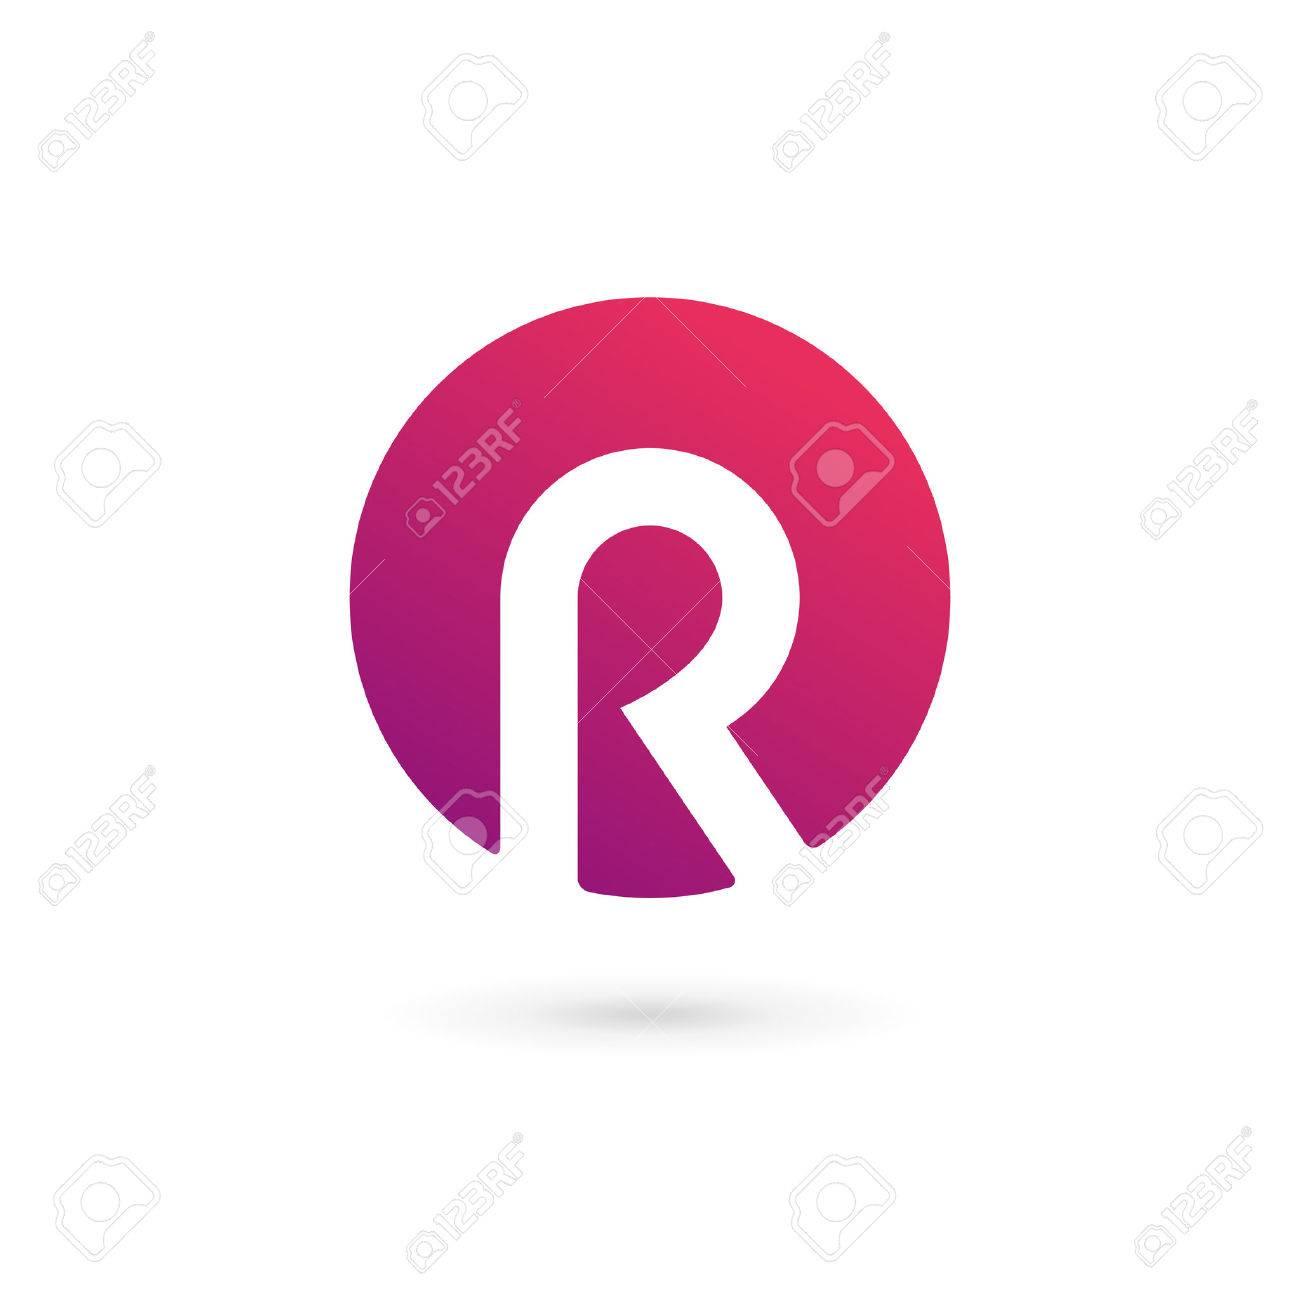 Letter r logo stock photos royalty free letter r logo images letter r logo icon design template elements illustration altavistaventures Gallery